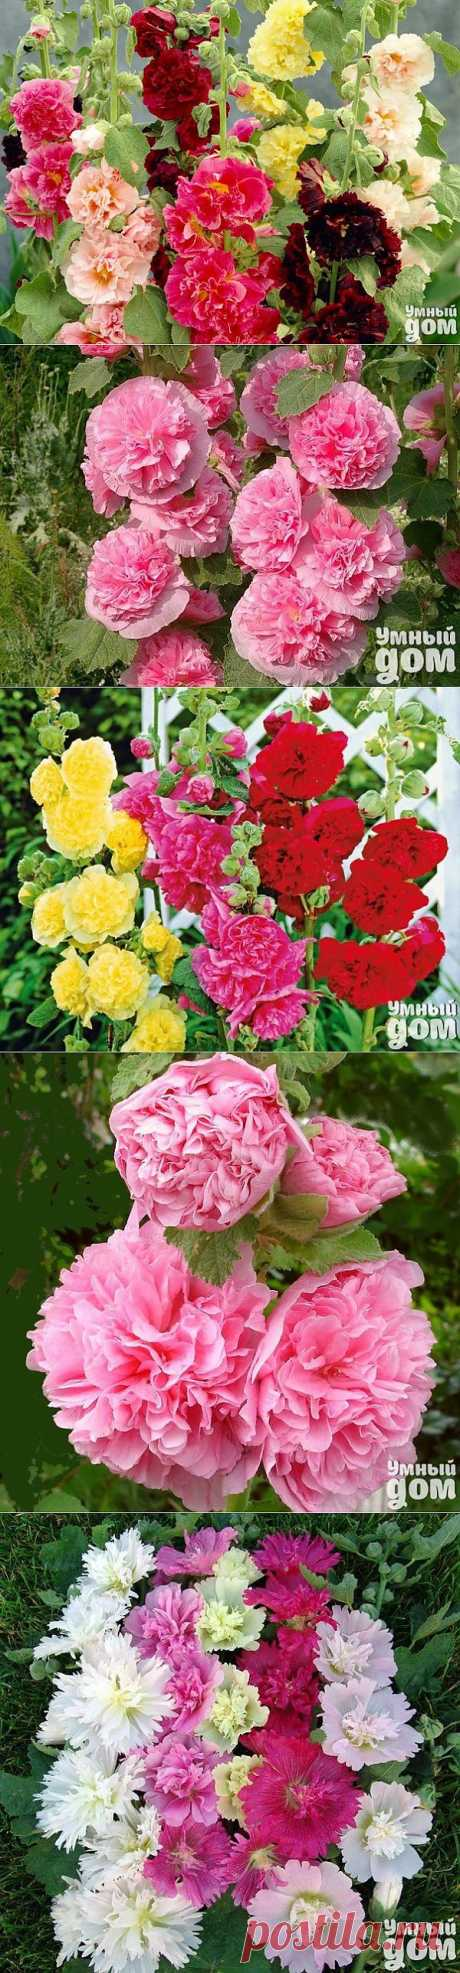 Шток роза, она же мальва, выращивание и уход